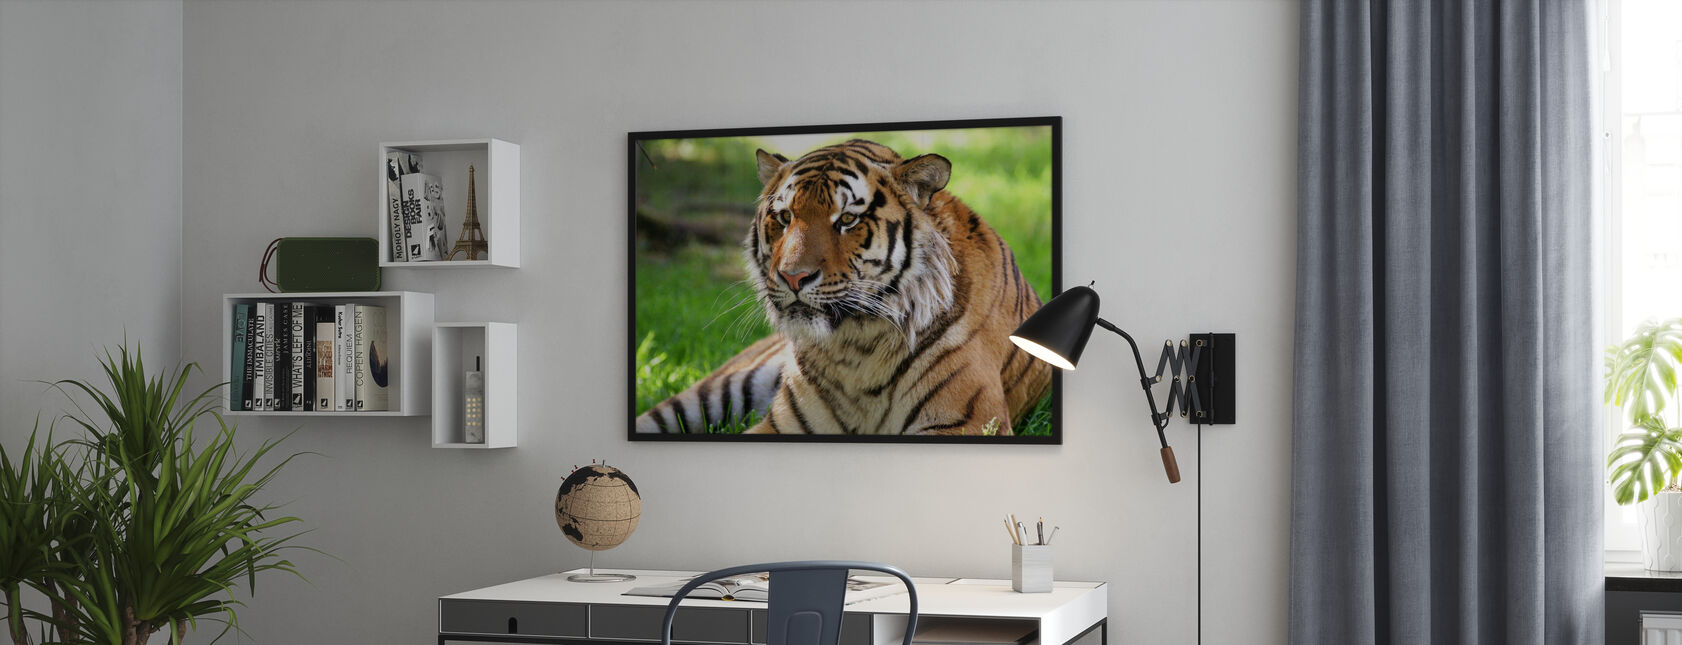 Tiger - Poster - Uffici